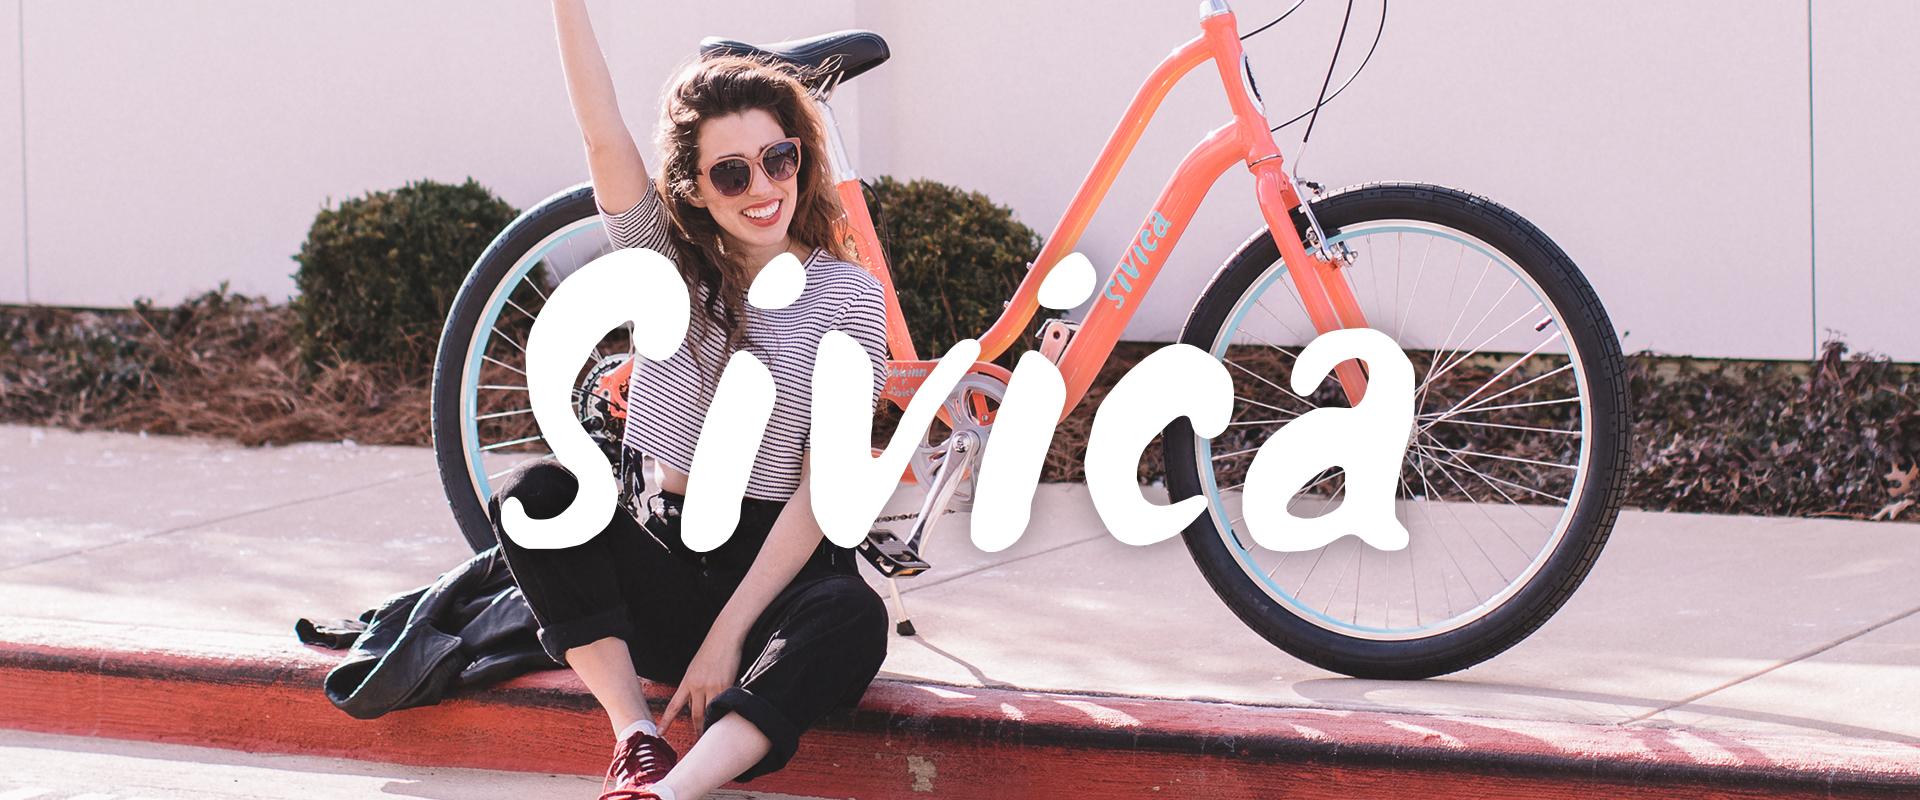 Sivica_Hero-4.jpg